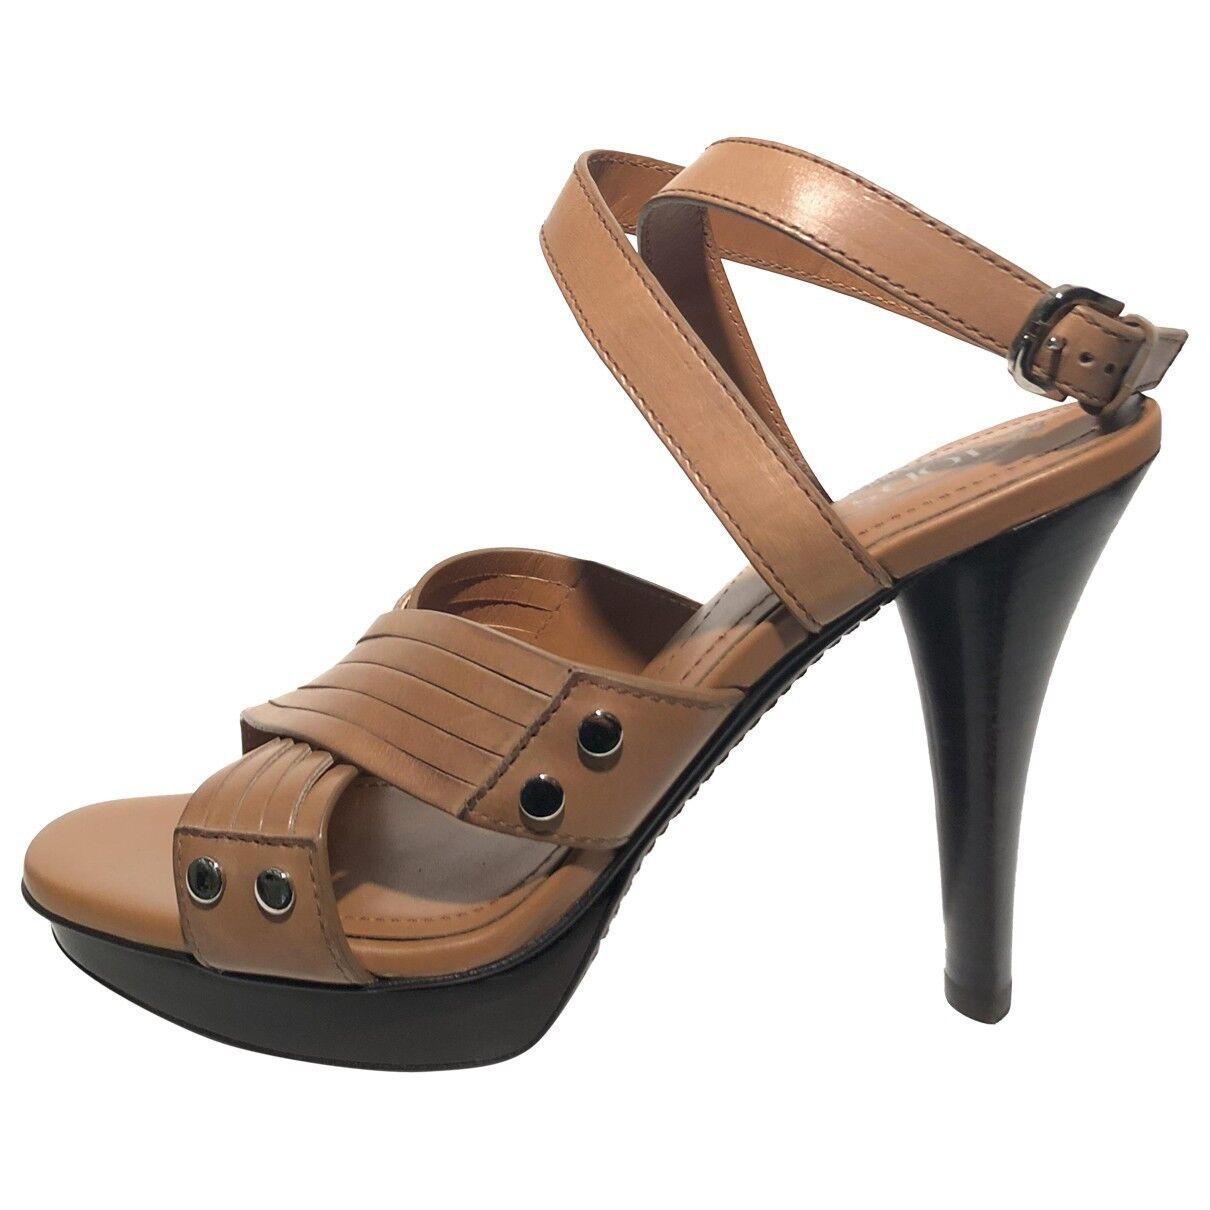 TOD'S Women's Leather Sandals Heels Heels Sandals - Brown NIB Size 38 8 1f7af7